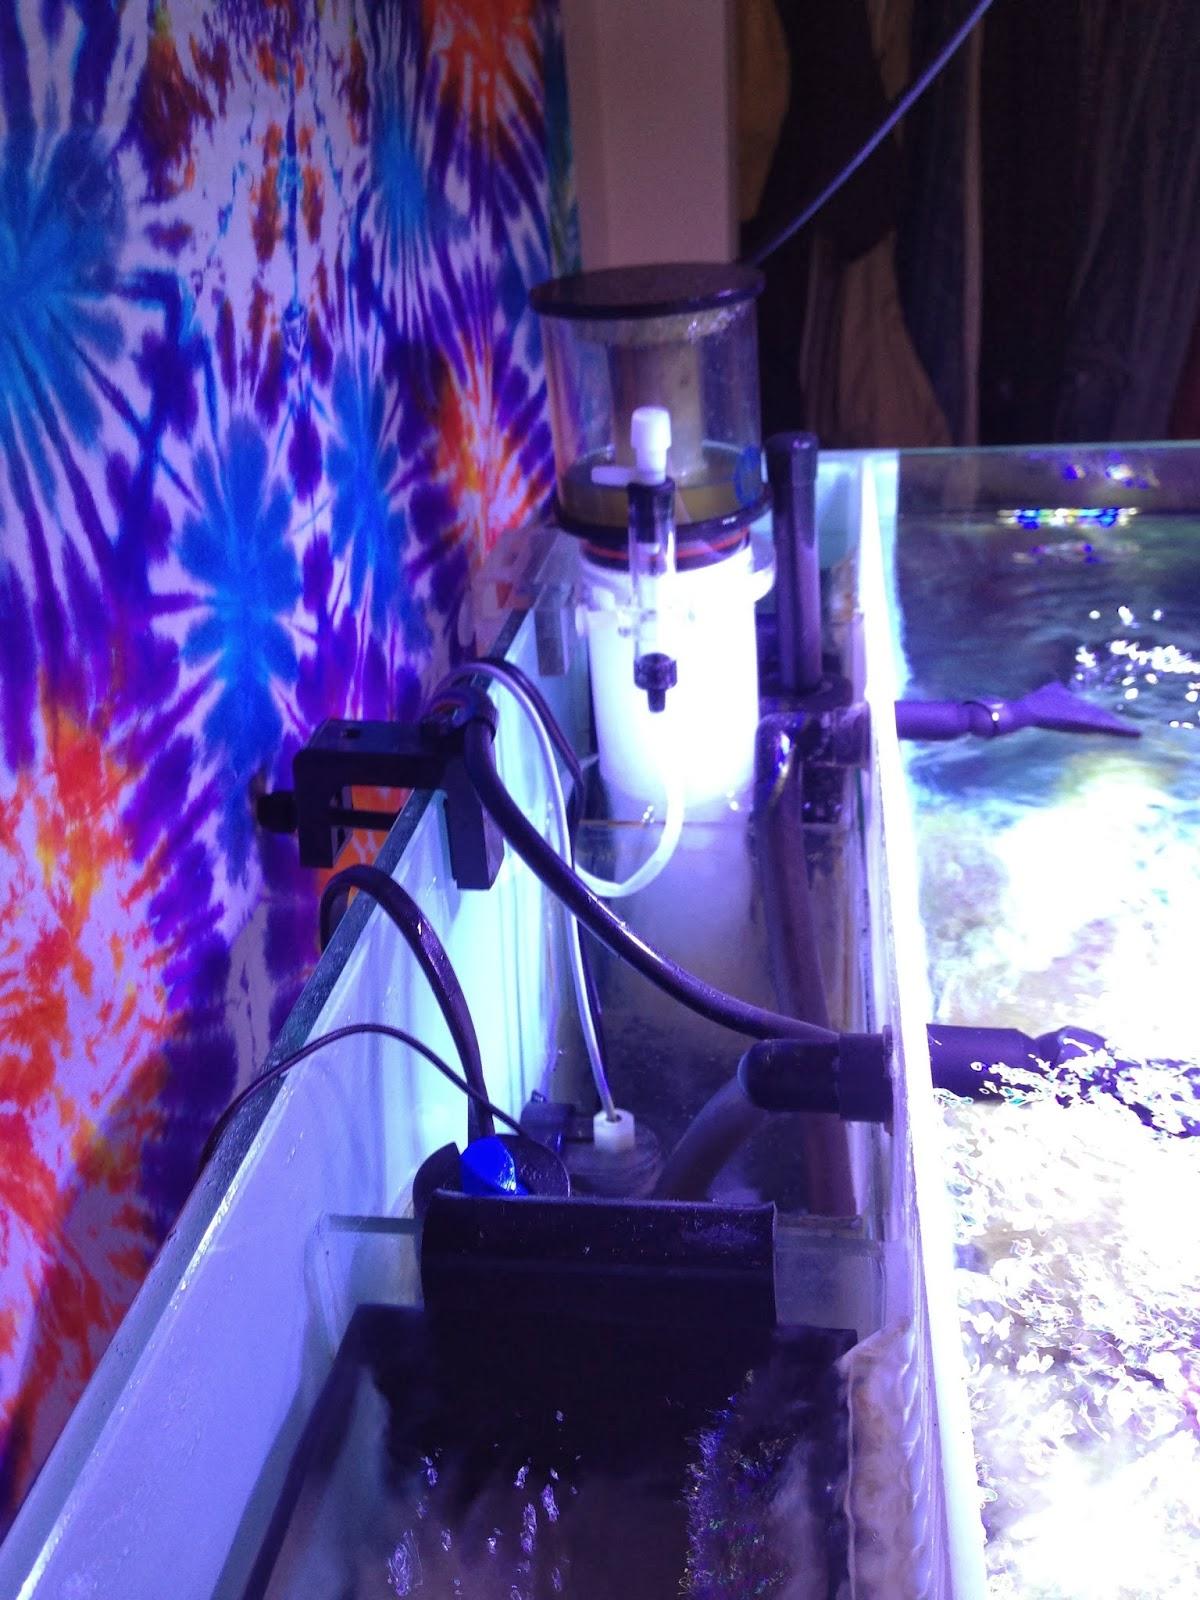 Marine Depot Blog: New Tank Build: 38 Gallon Nuvo Aquarium